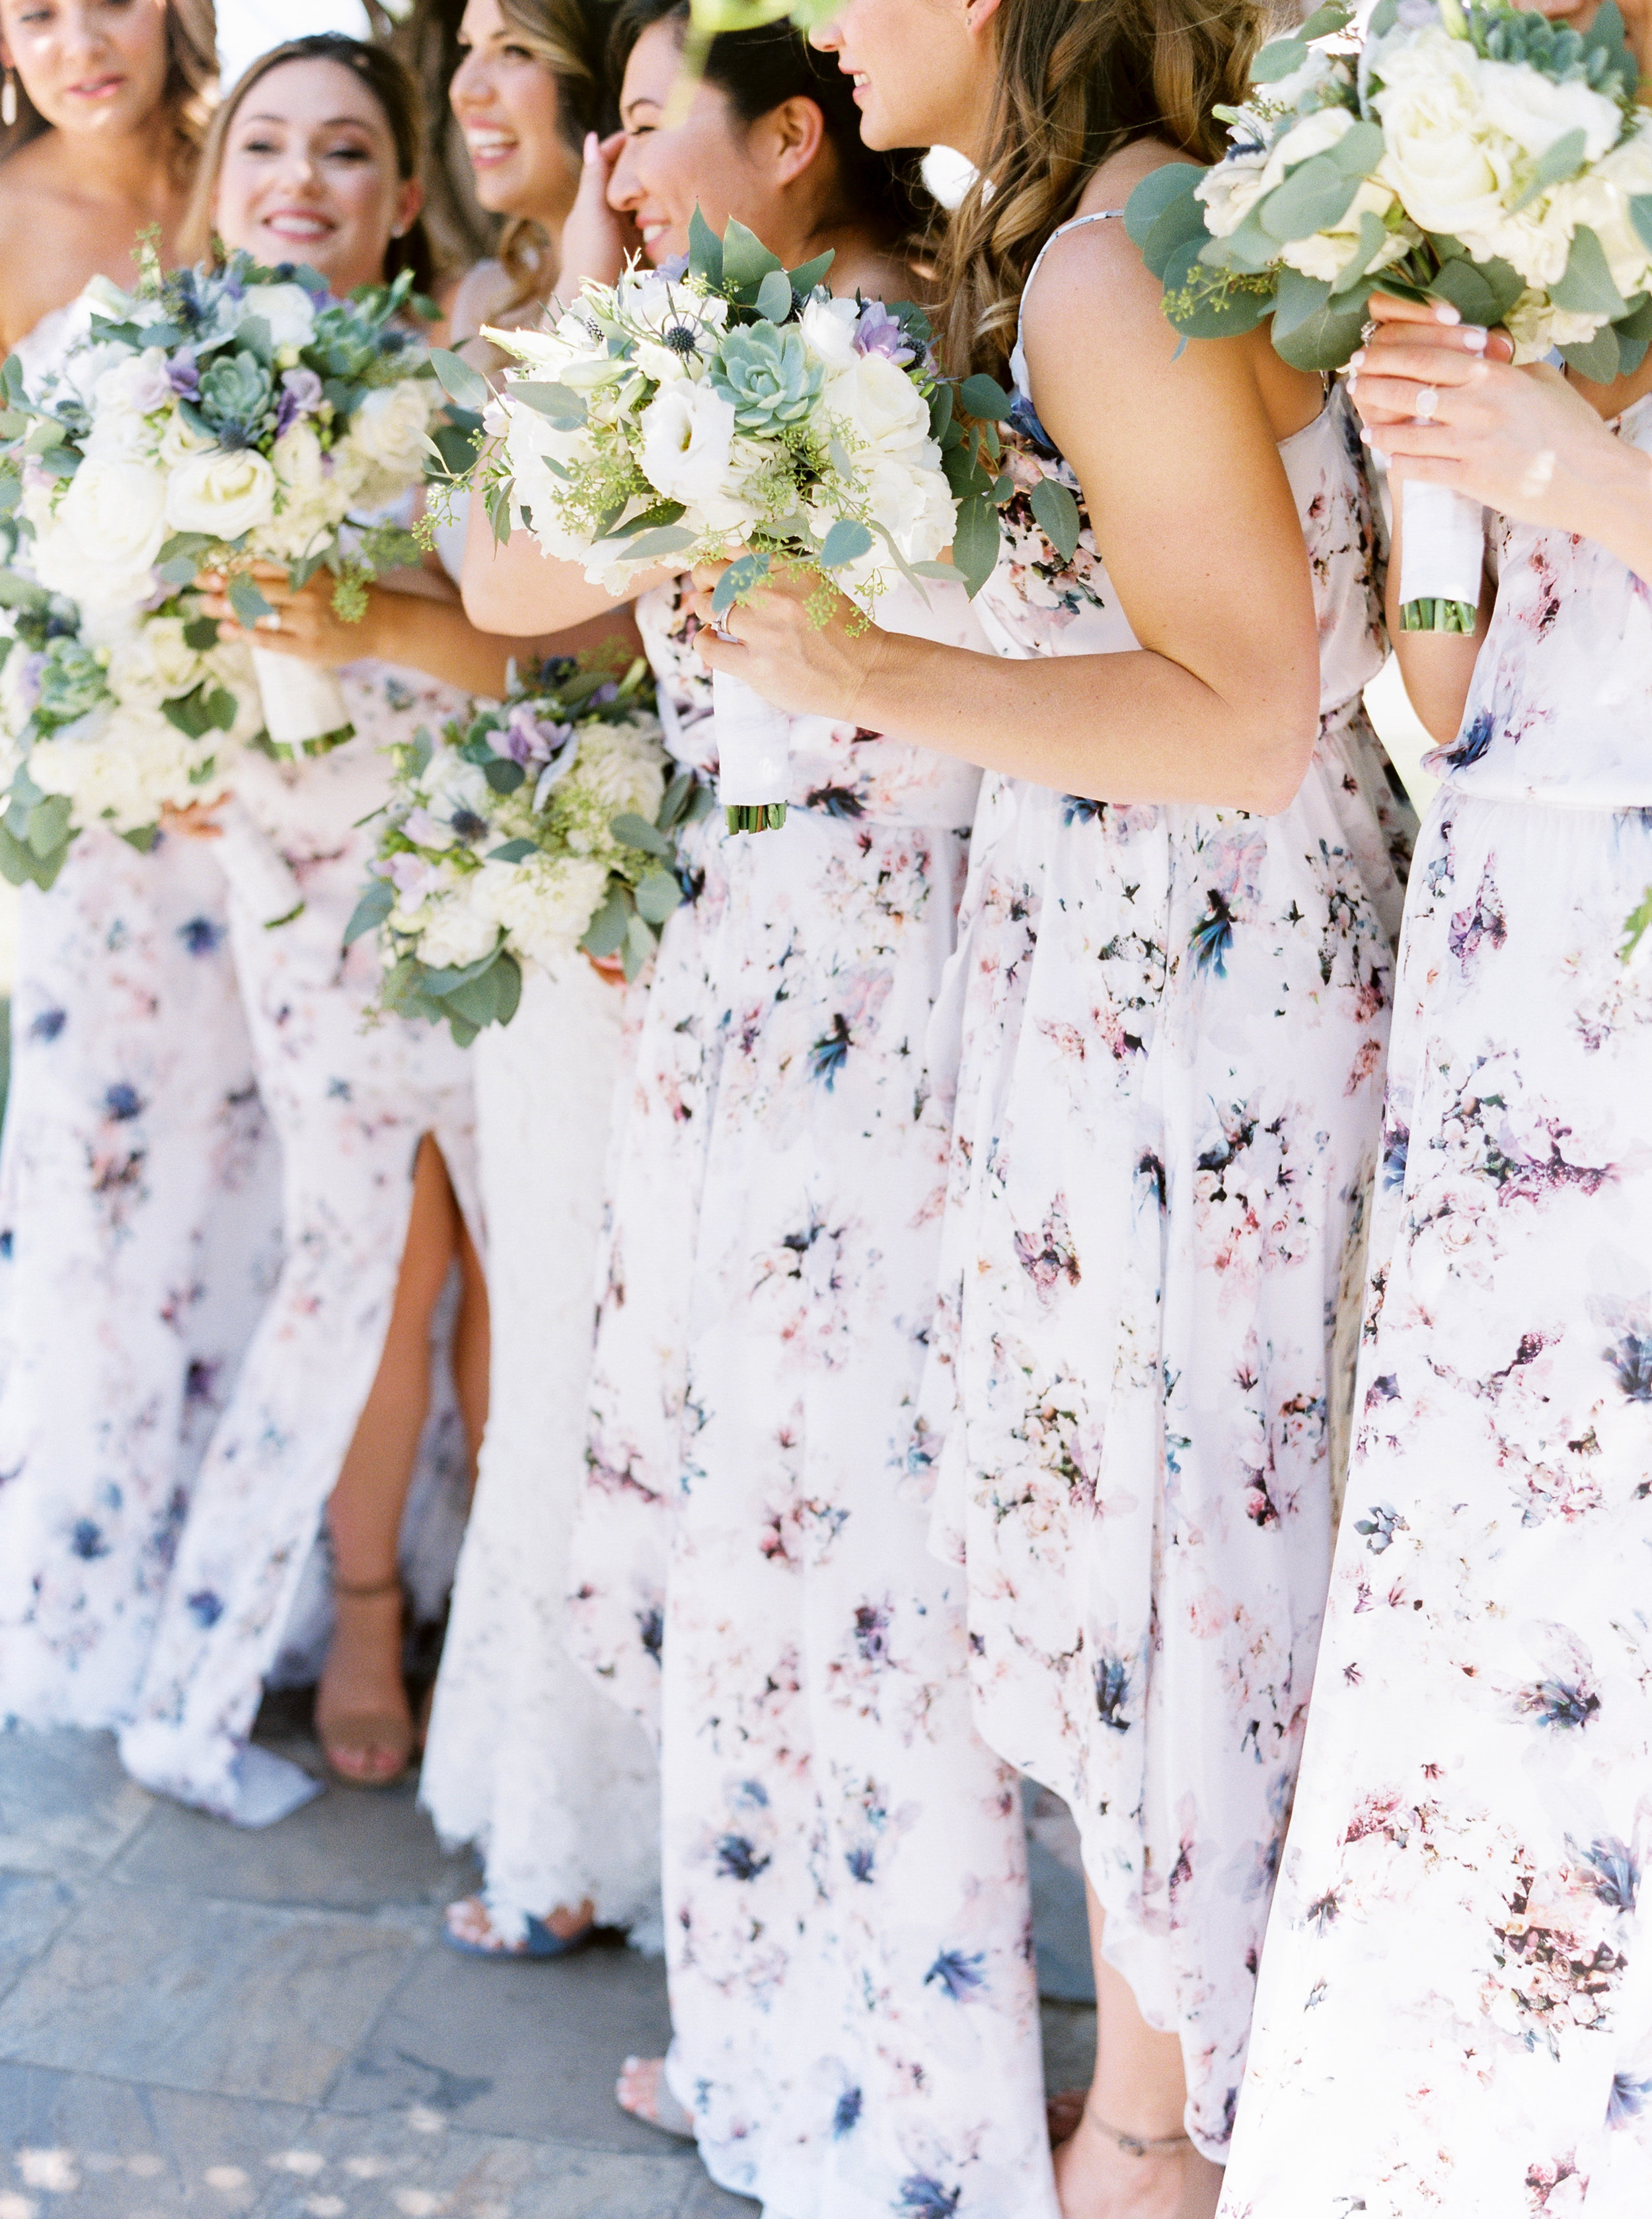 the-purple-orchid-resort-wedding-in-livermore-california-207.jpg